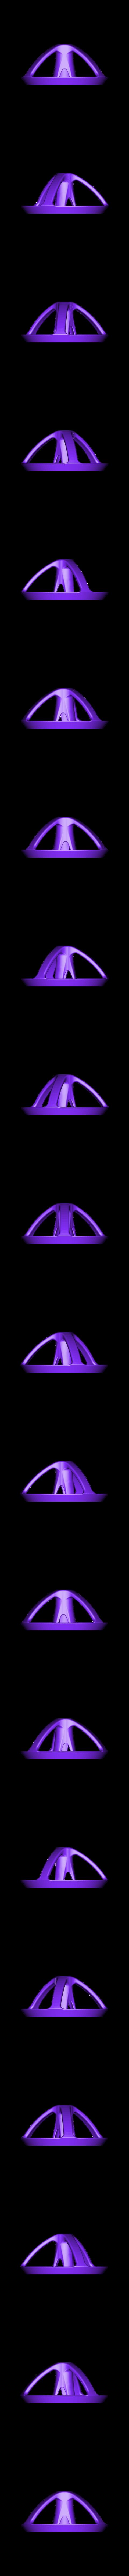 QX7_Gimbal_Protector_V2_8.4mm.stl Télécharger fichier STL gratuit Protecteur de cardan QX7 • Objet à imprimer en 3D, Elliott